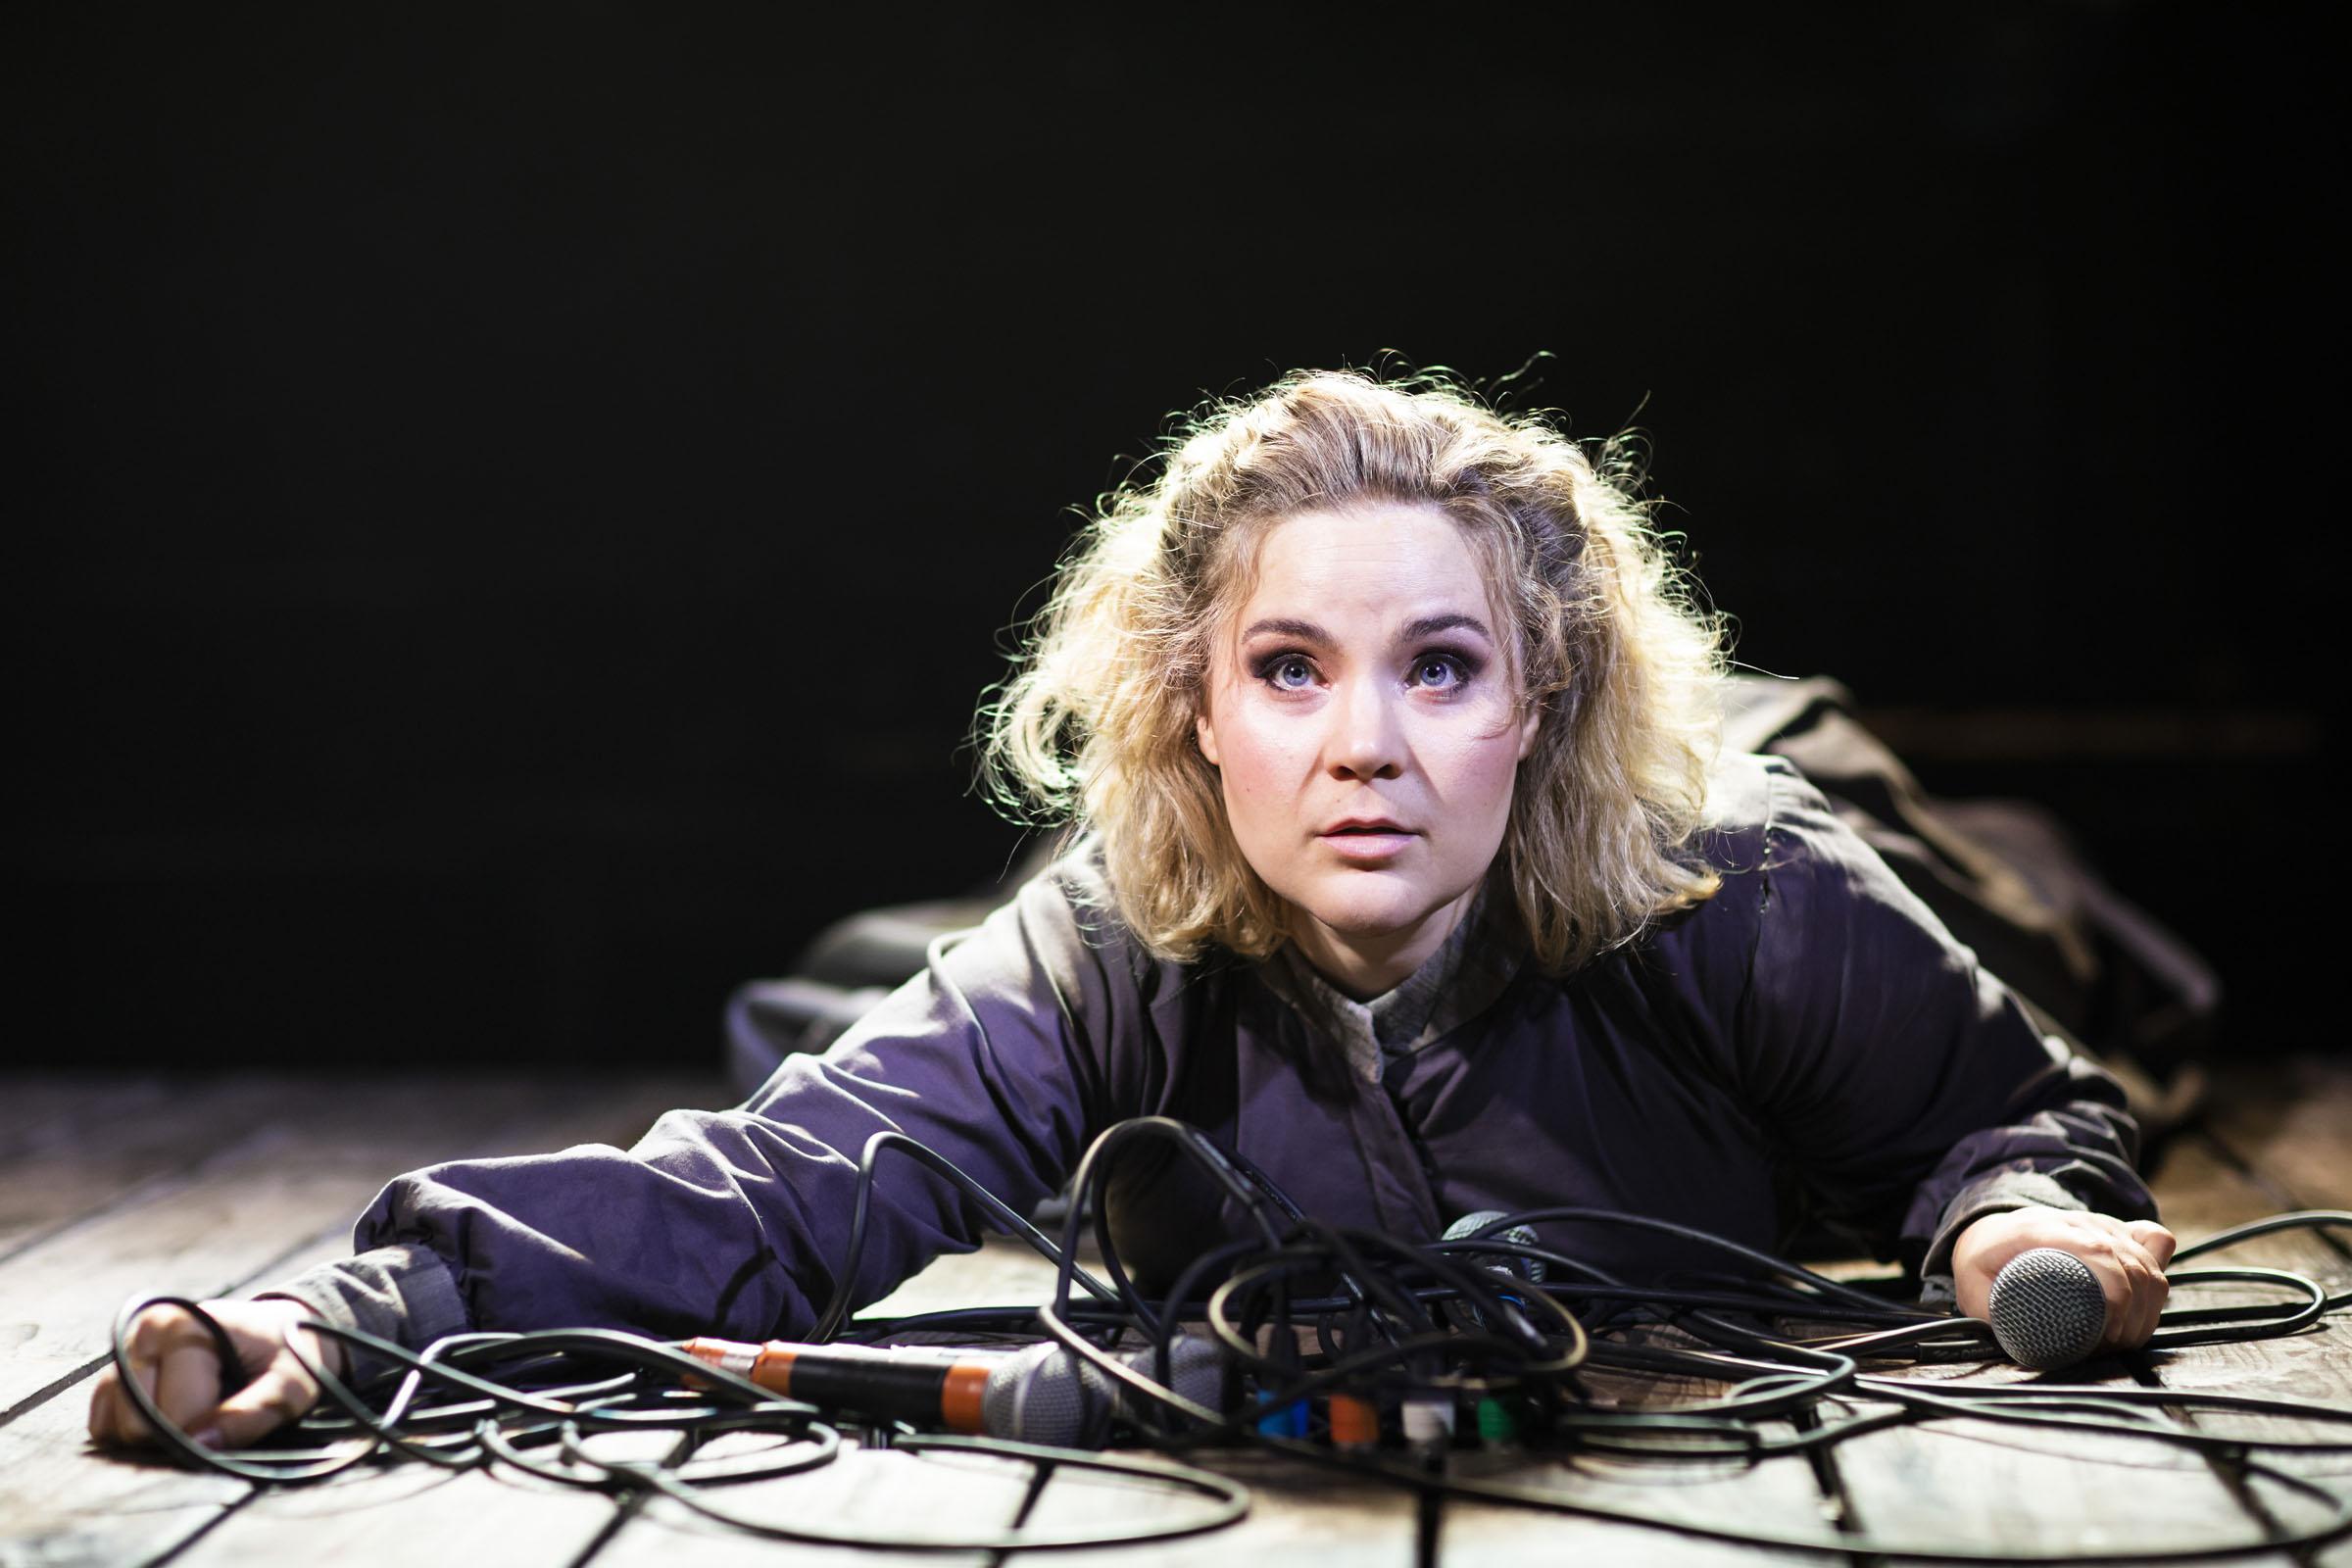 Natasha J. Barnes as Charlotte Brontë